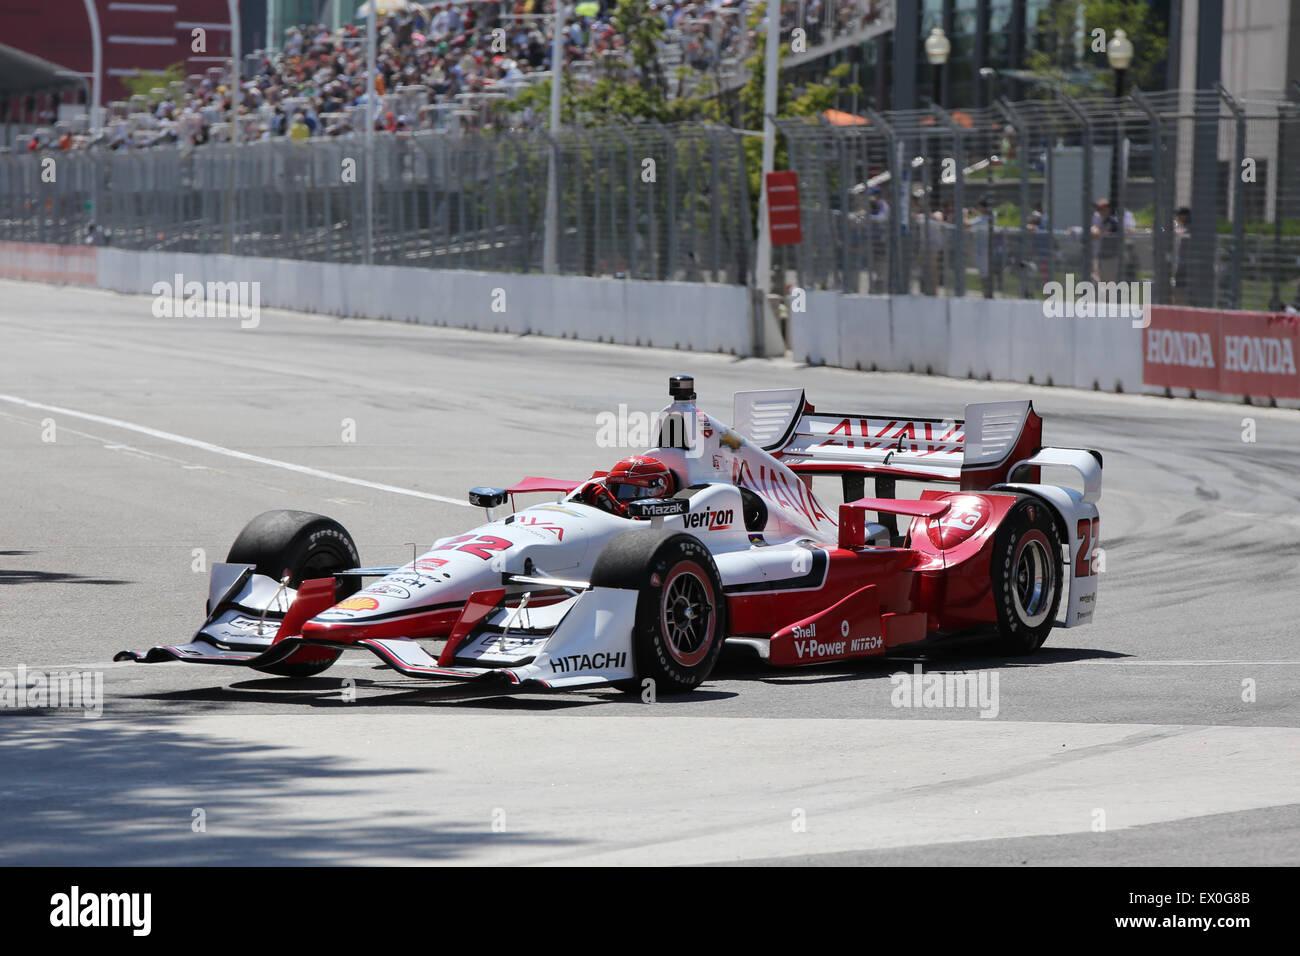 Evento público de Toronto Hondy Indy Car Racing Weekend Imagen De Stock